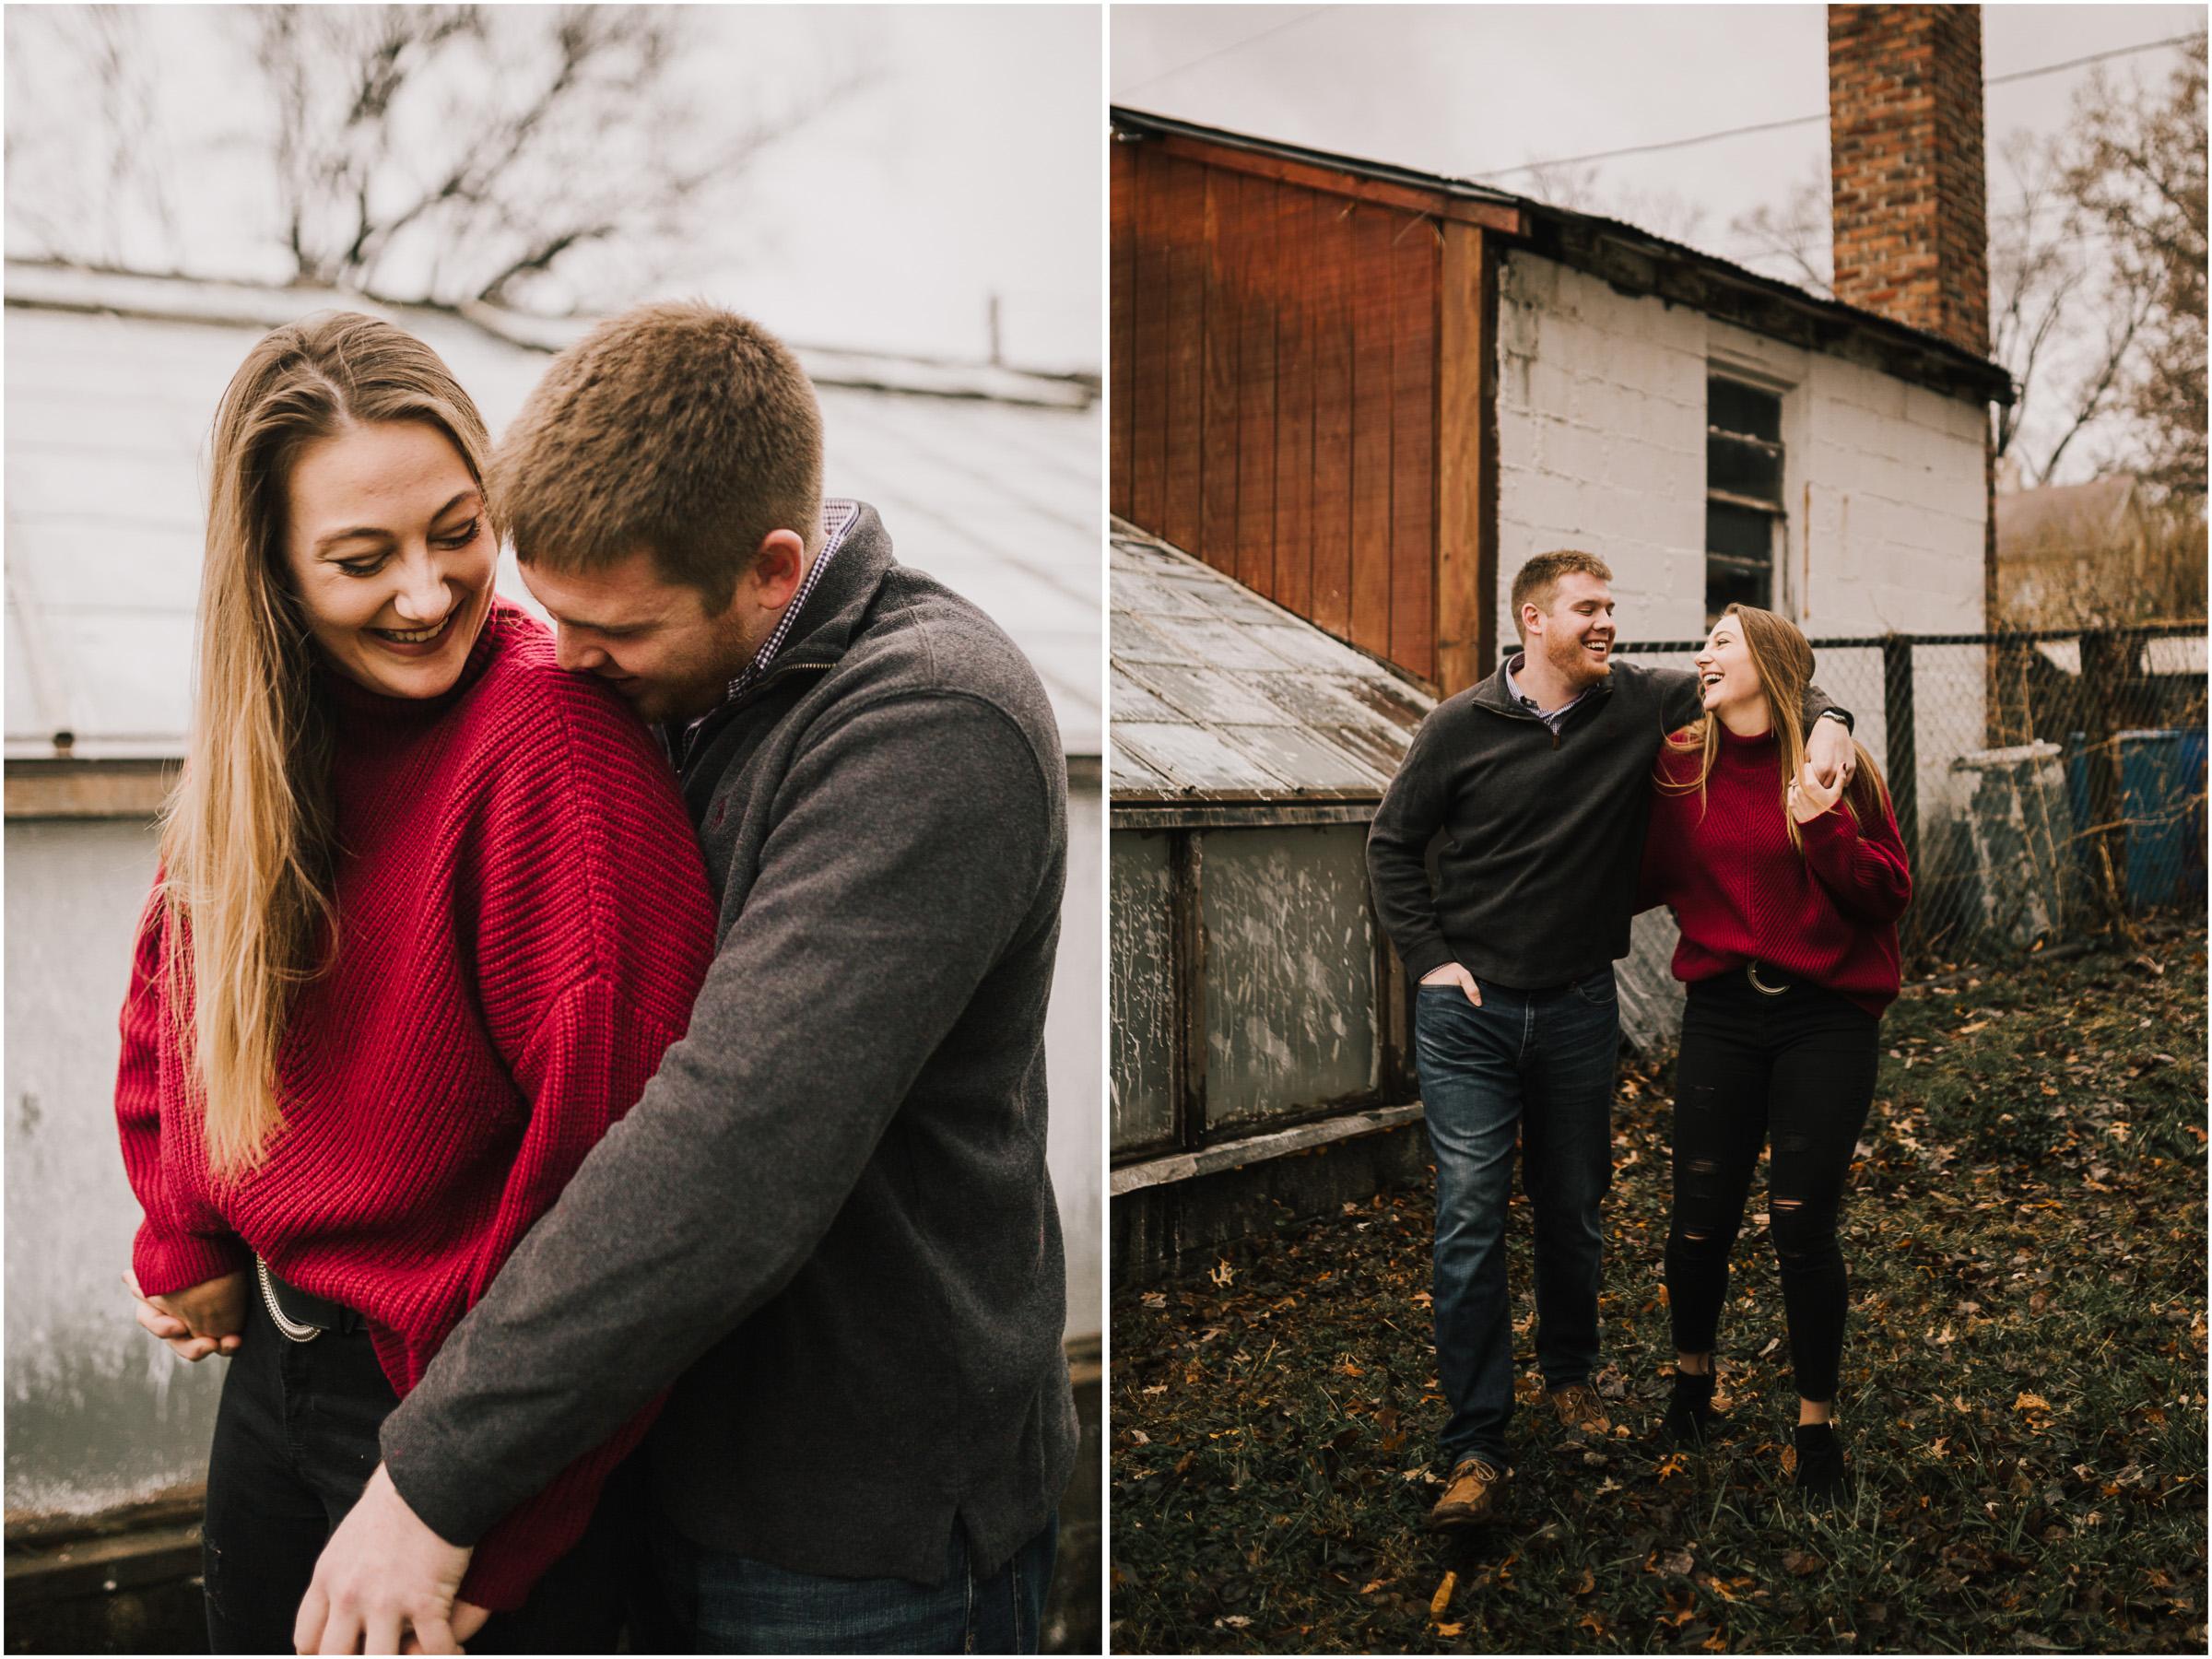 alyssa barletter photography johns greenhouse kansas city missouri brookside waldo engagement session winter-14.jpg